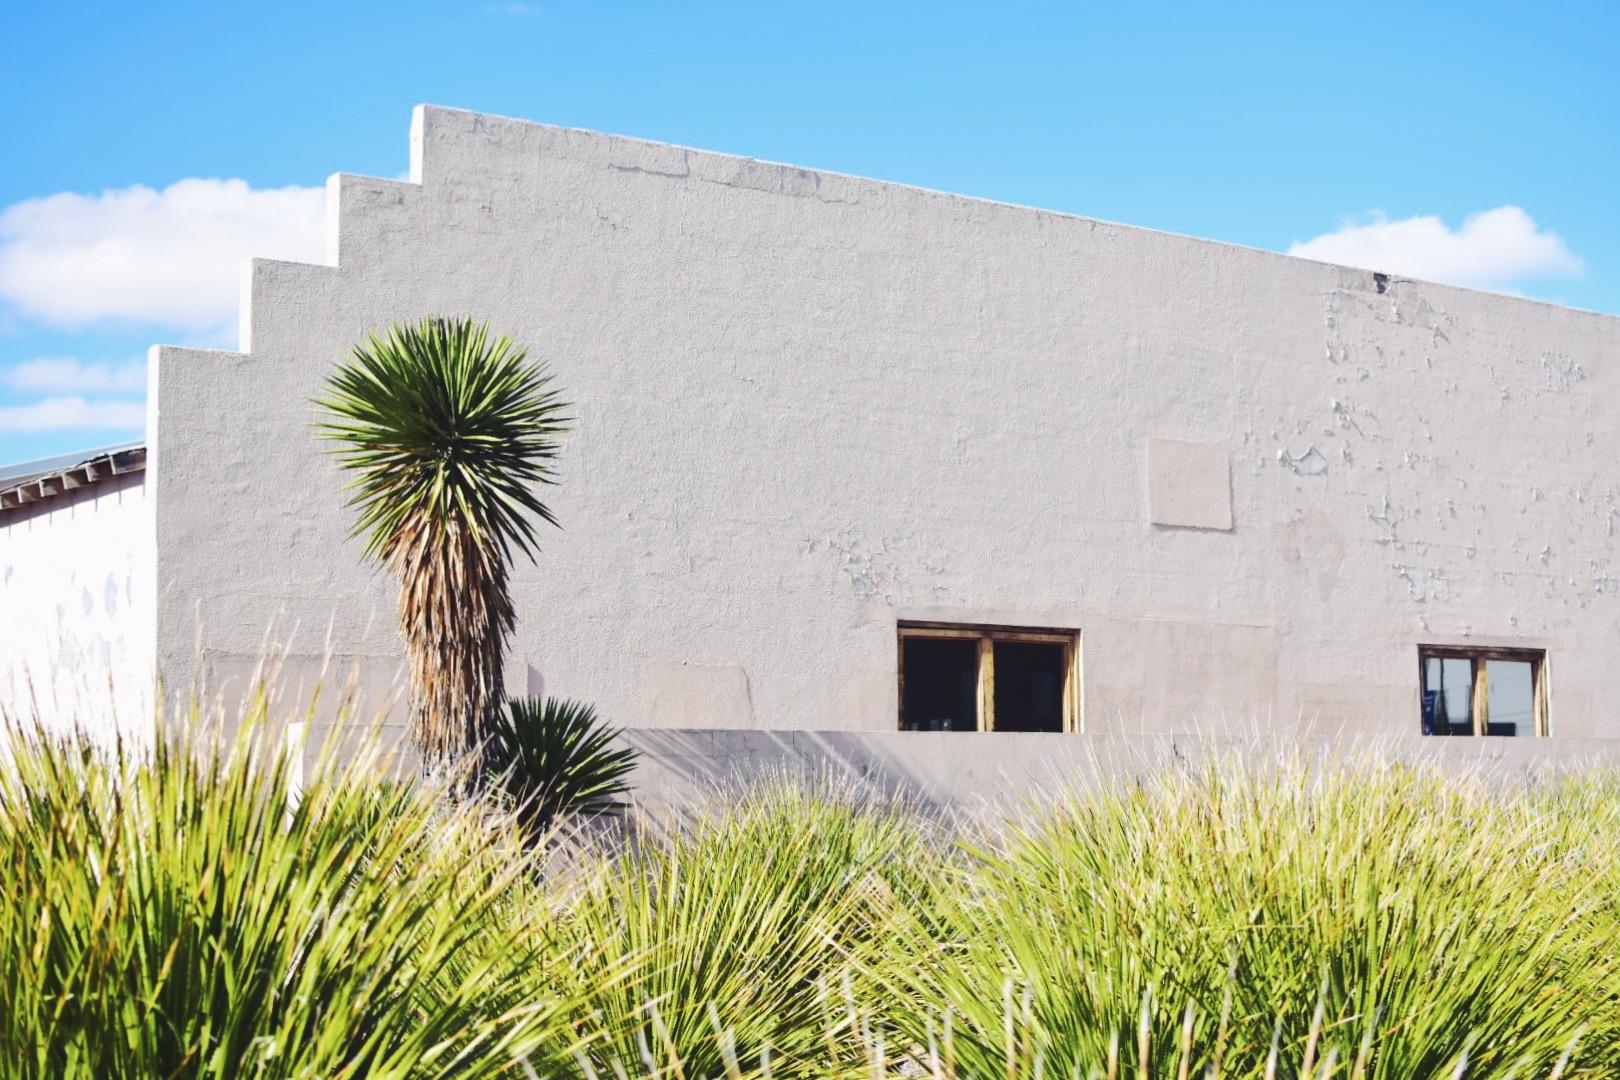 The elusive Chinati Foundation